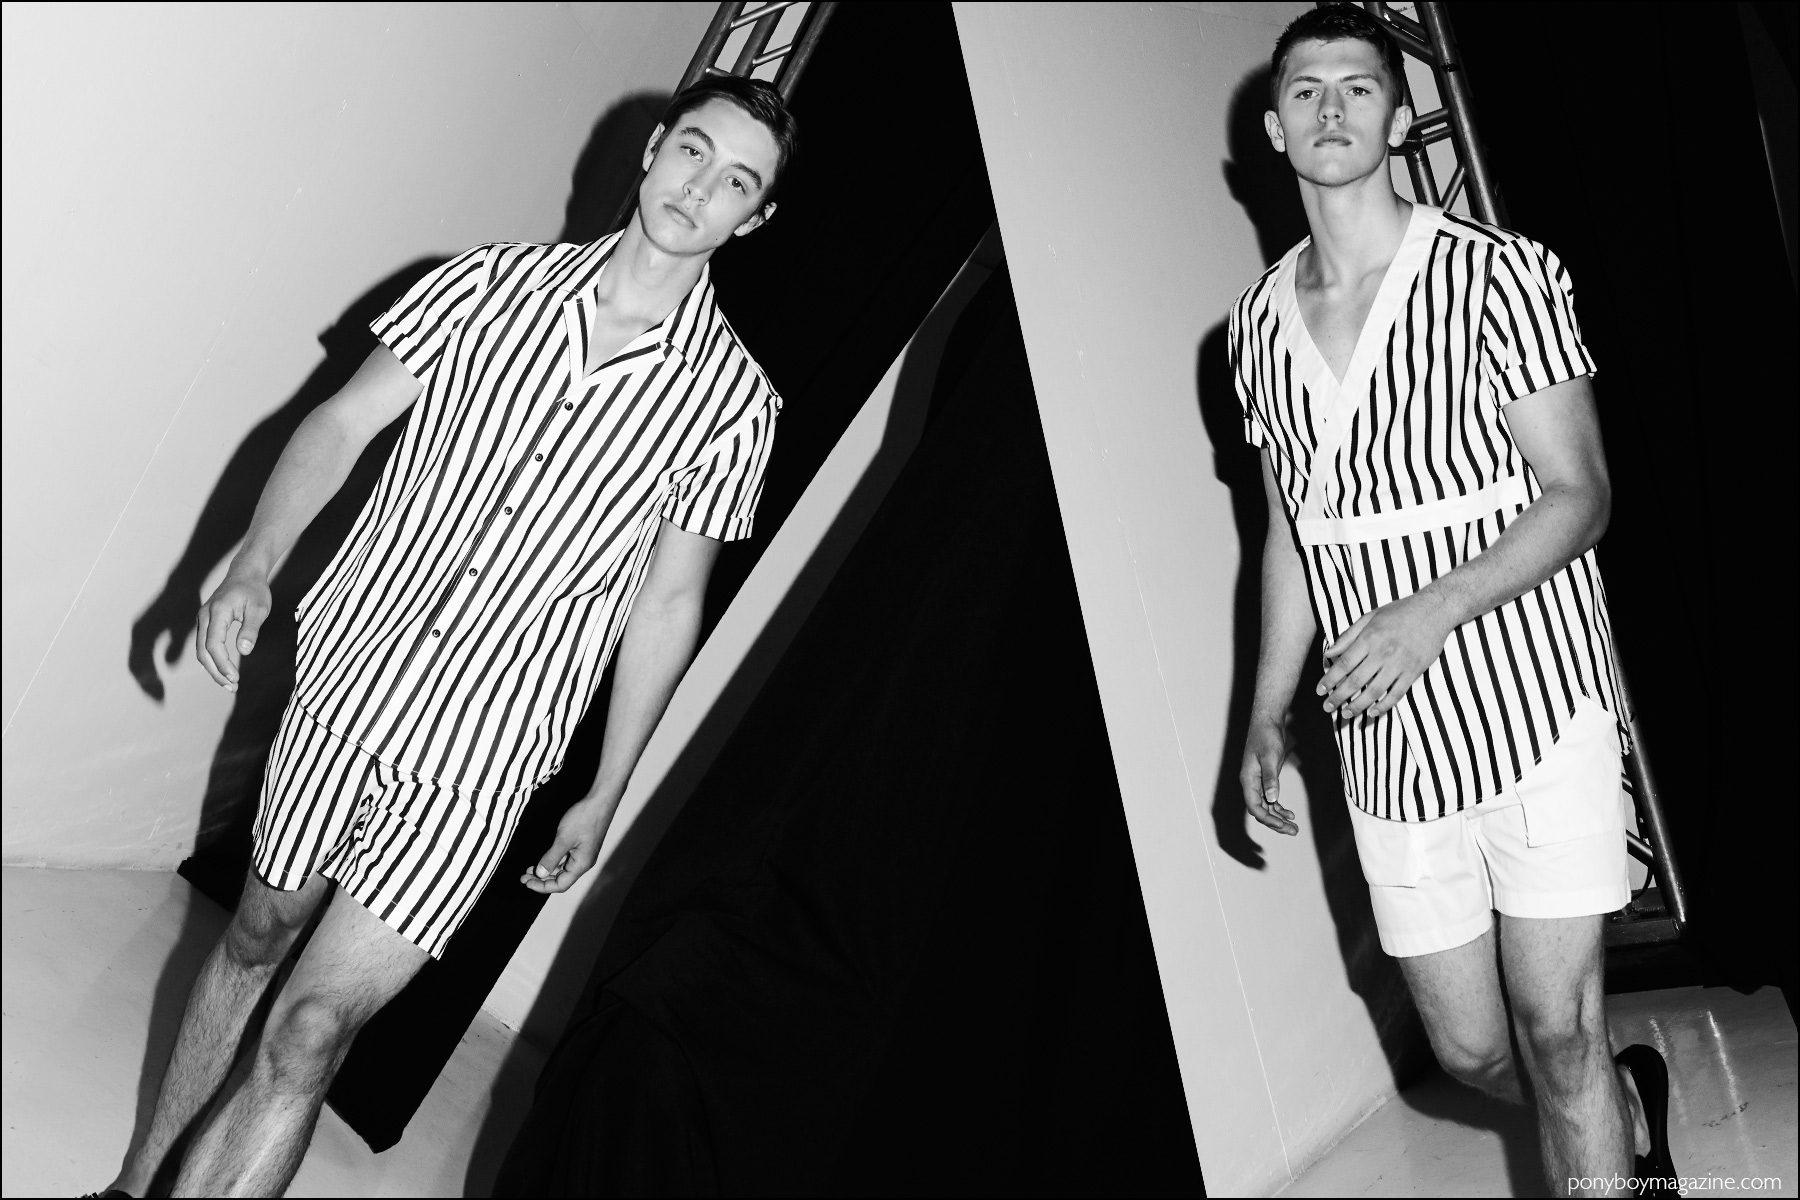 Models wear black & white stripe menswear at Carlos Campos Spring/Summer 2017 menswear show. Photography by Alexander Thompson for Ponyboy magazine NY.